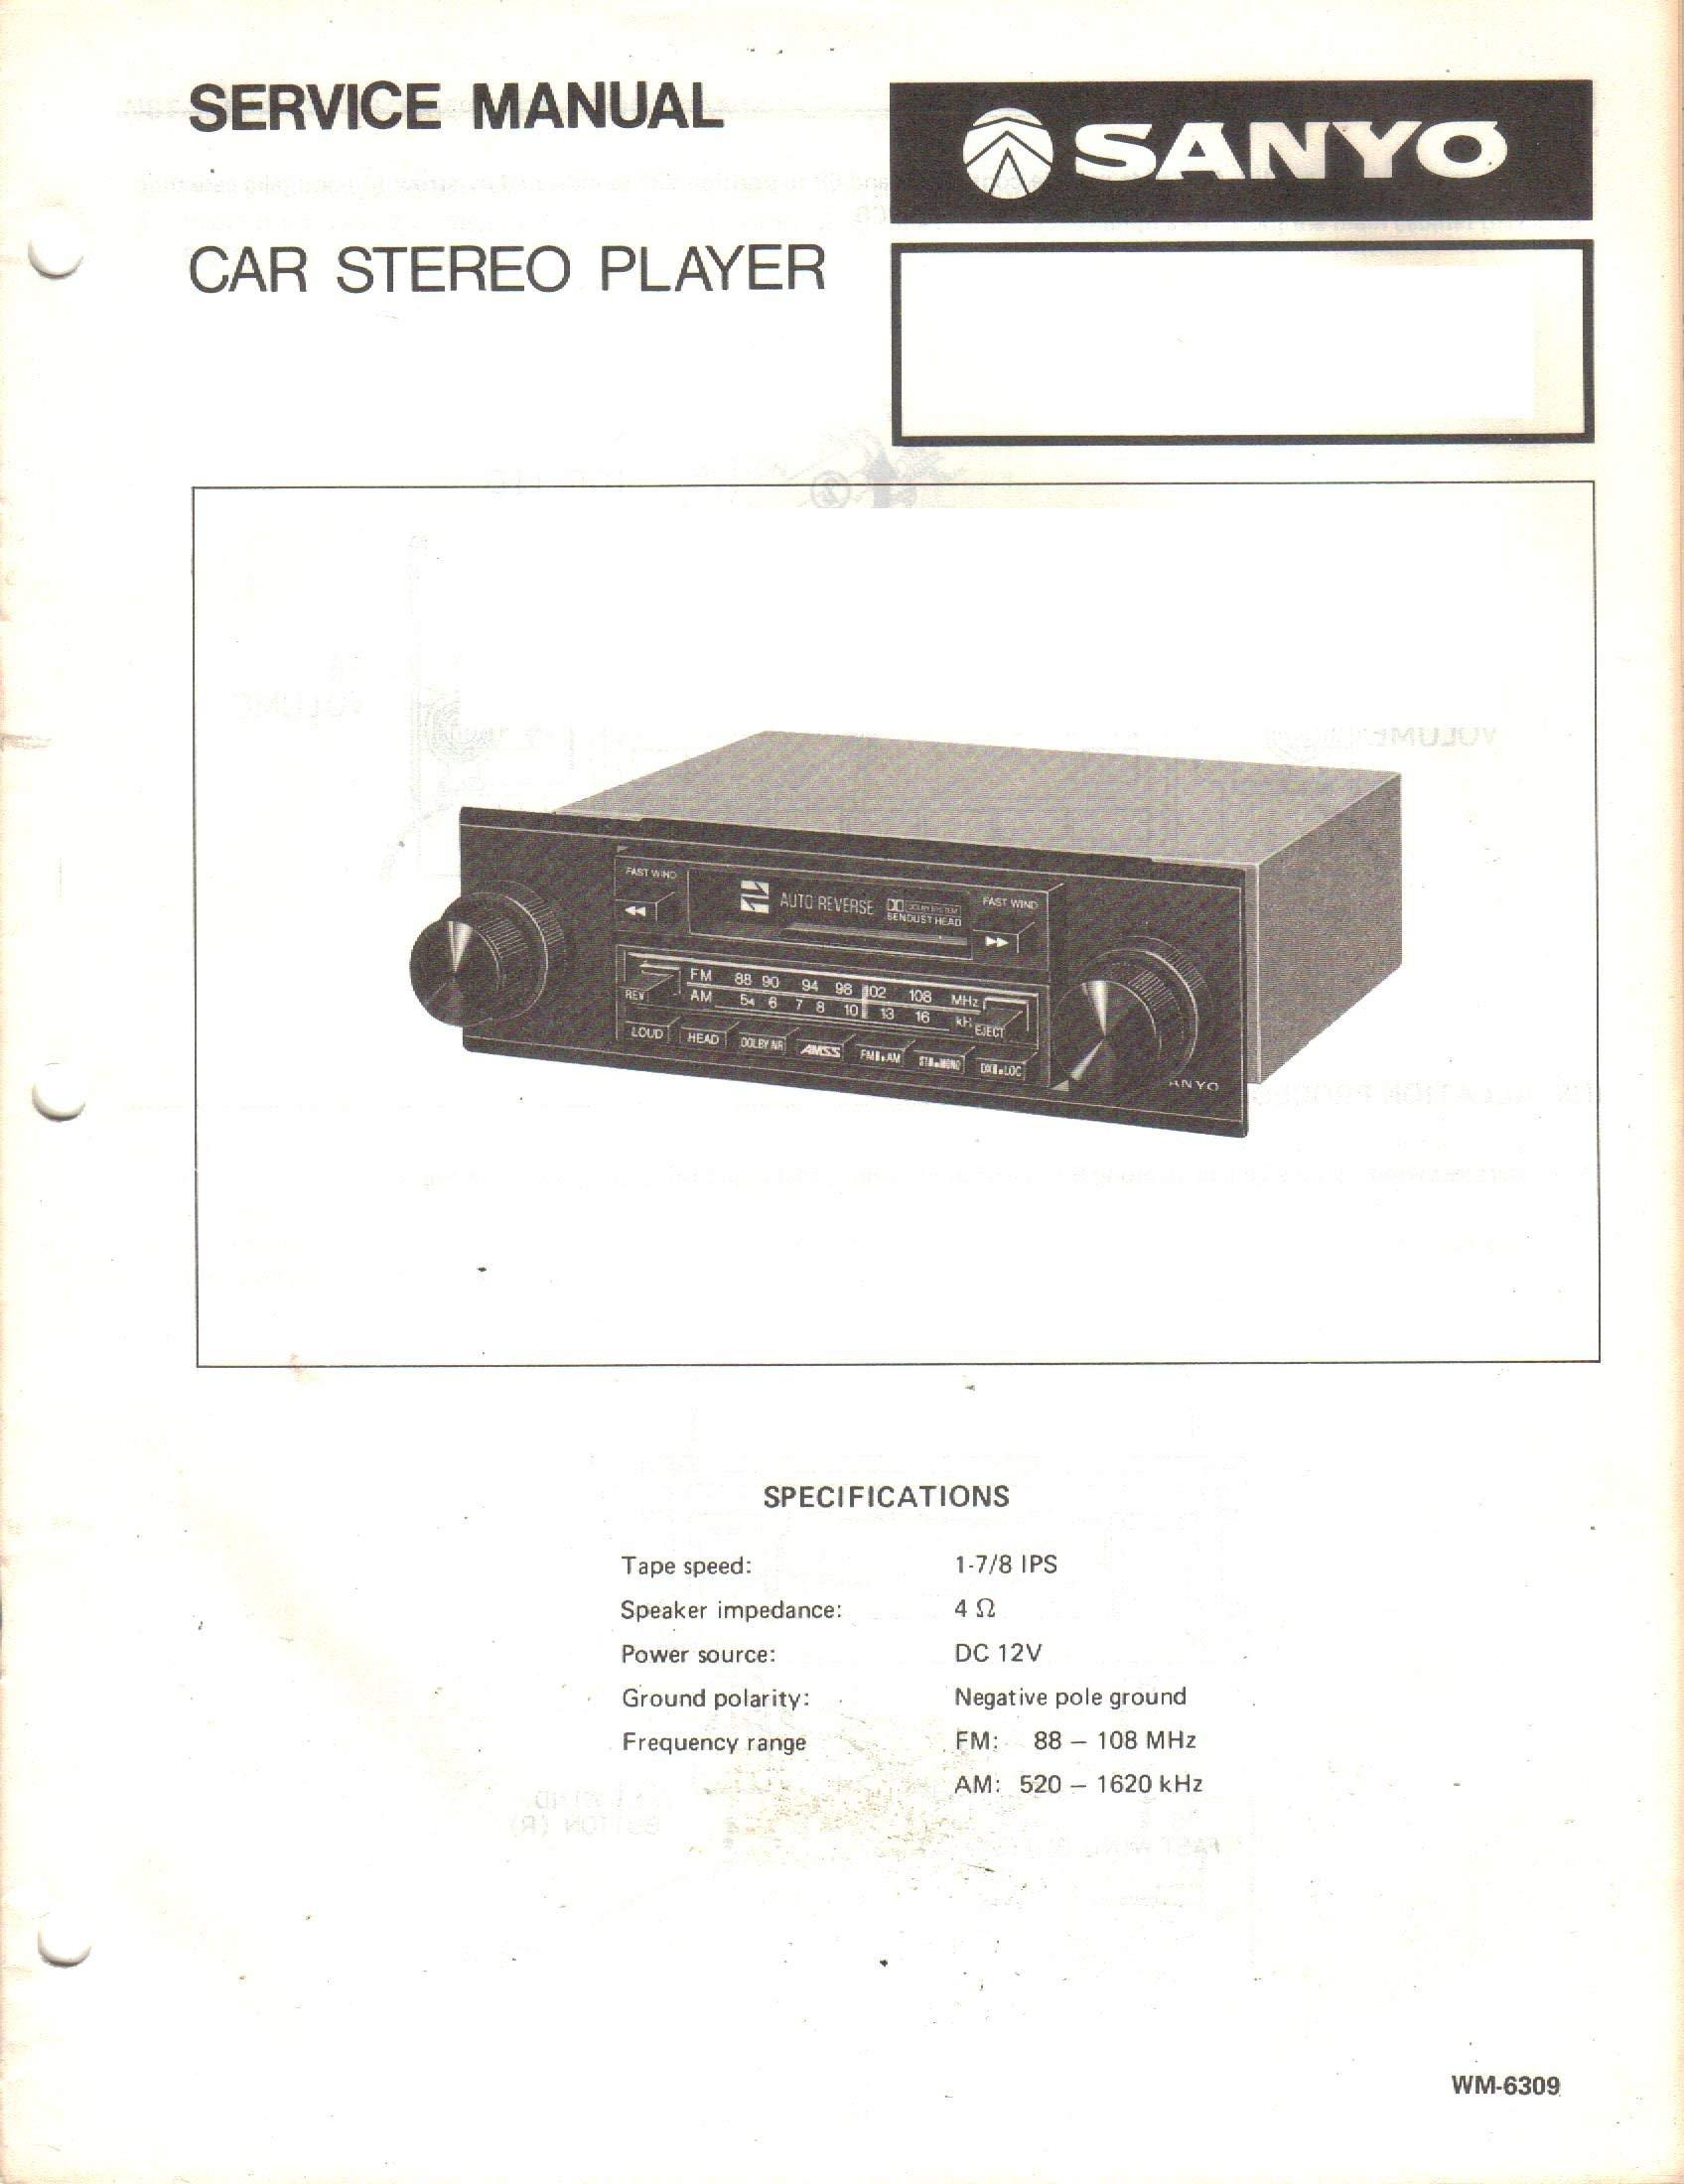 Service Manual for Sanyo FT1001A FT 1001A Car Stereo Player: Sanyo:  Amazon.com: BooksAmazon.com